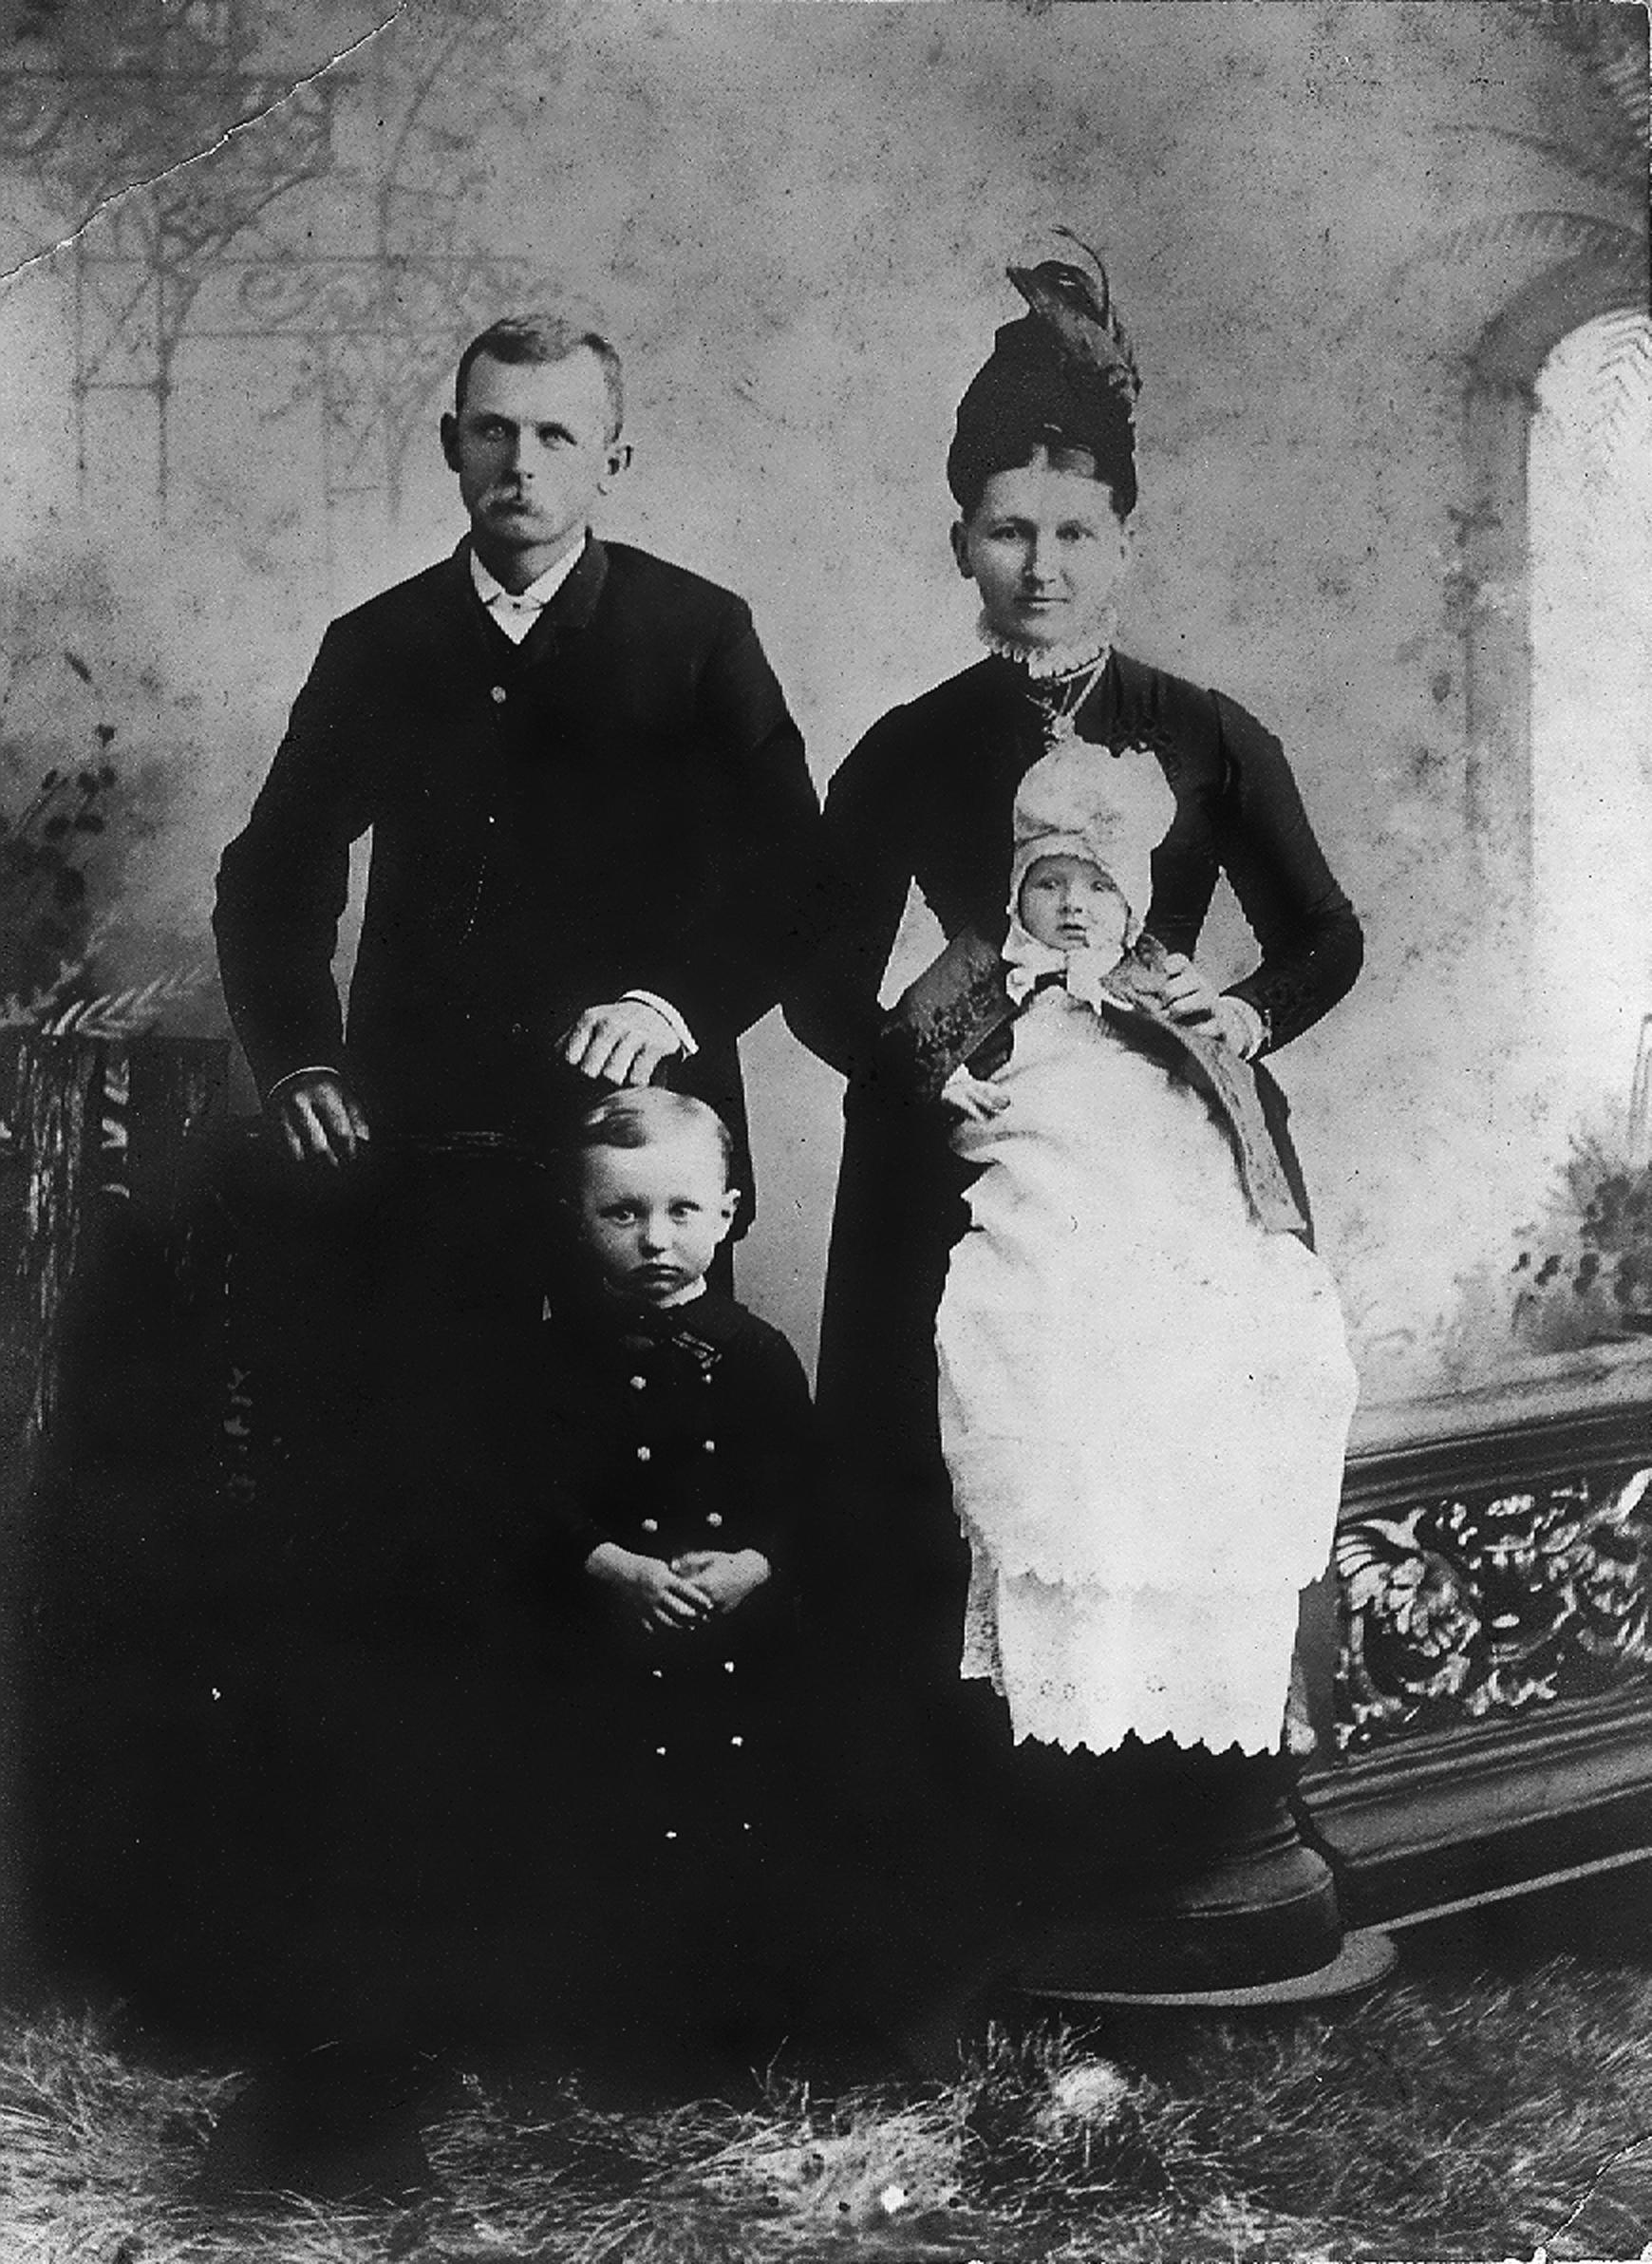 Dale Carnegie family portrait